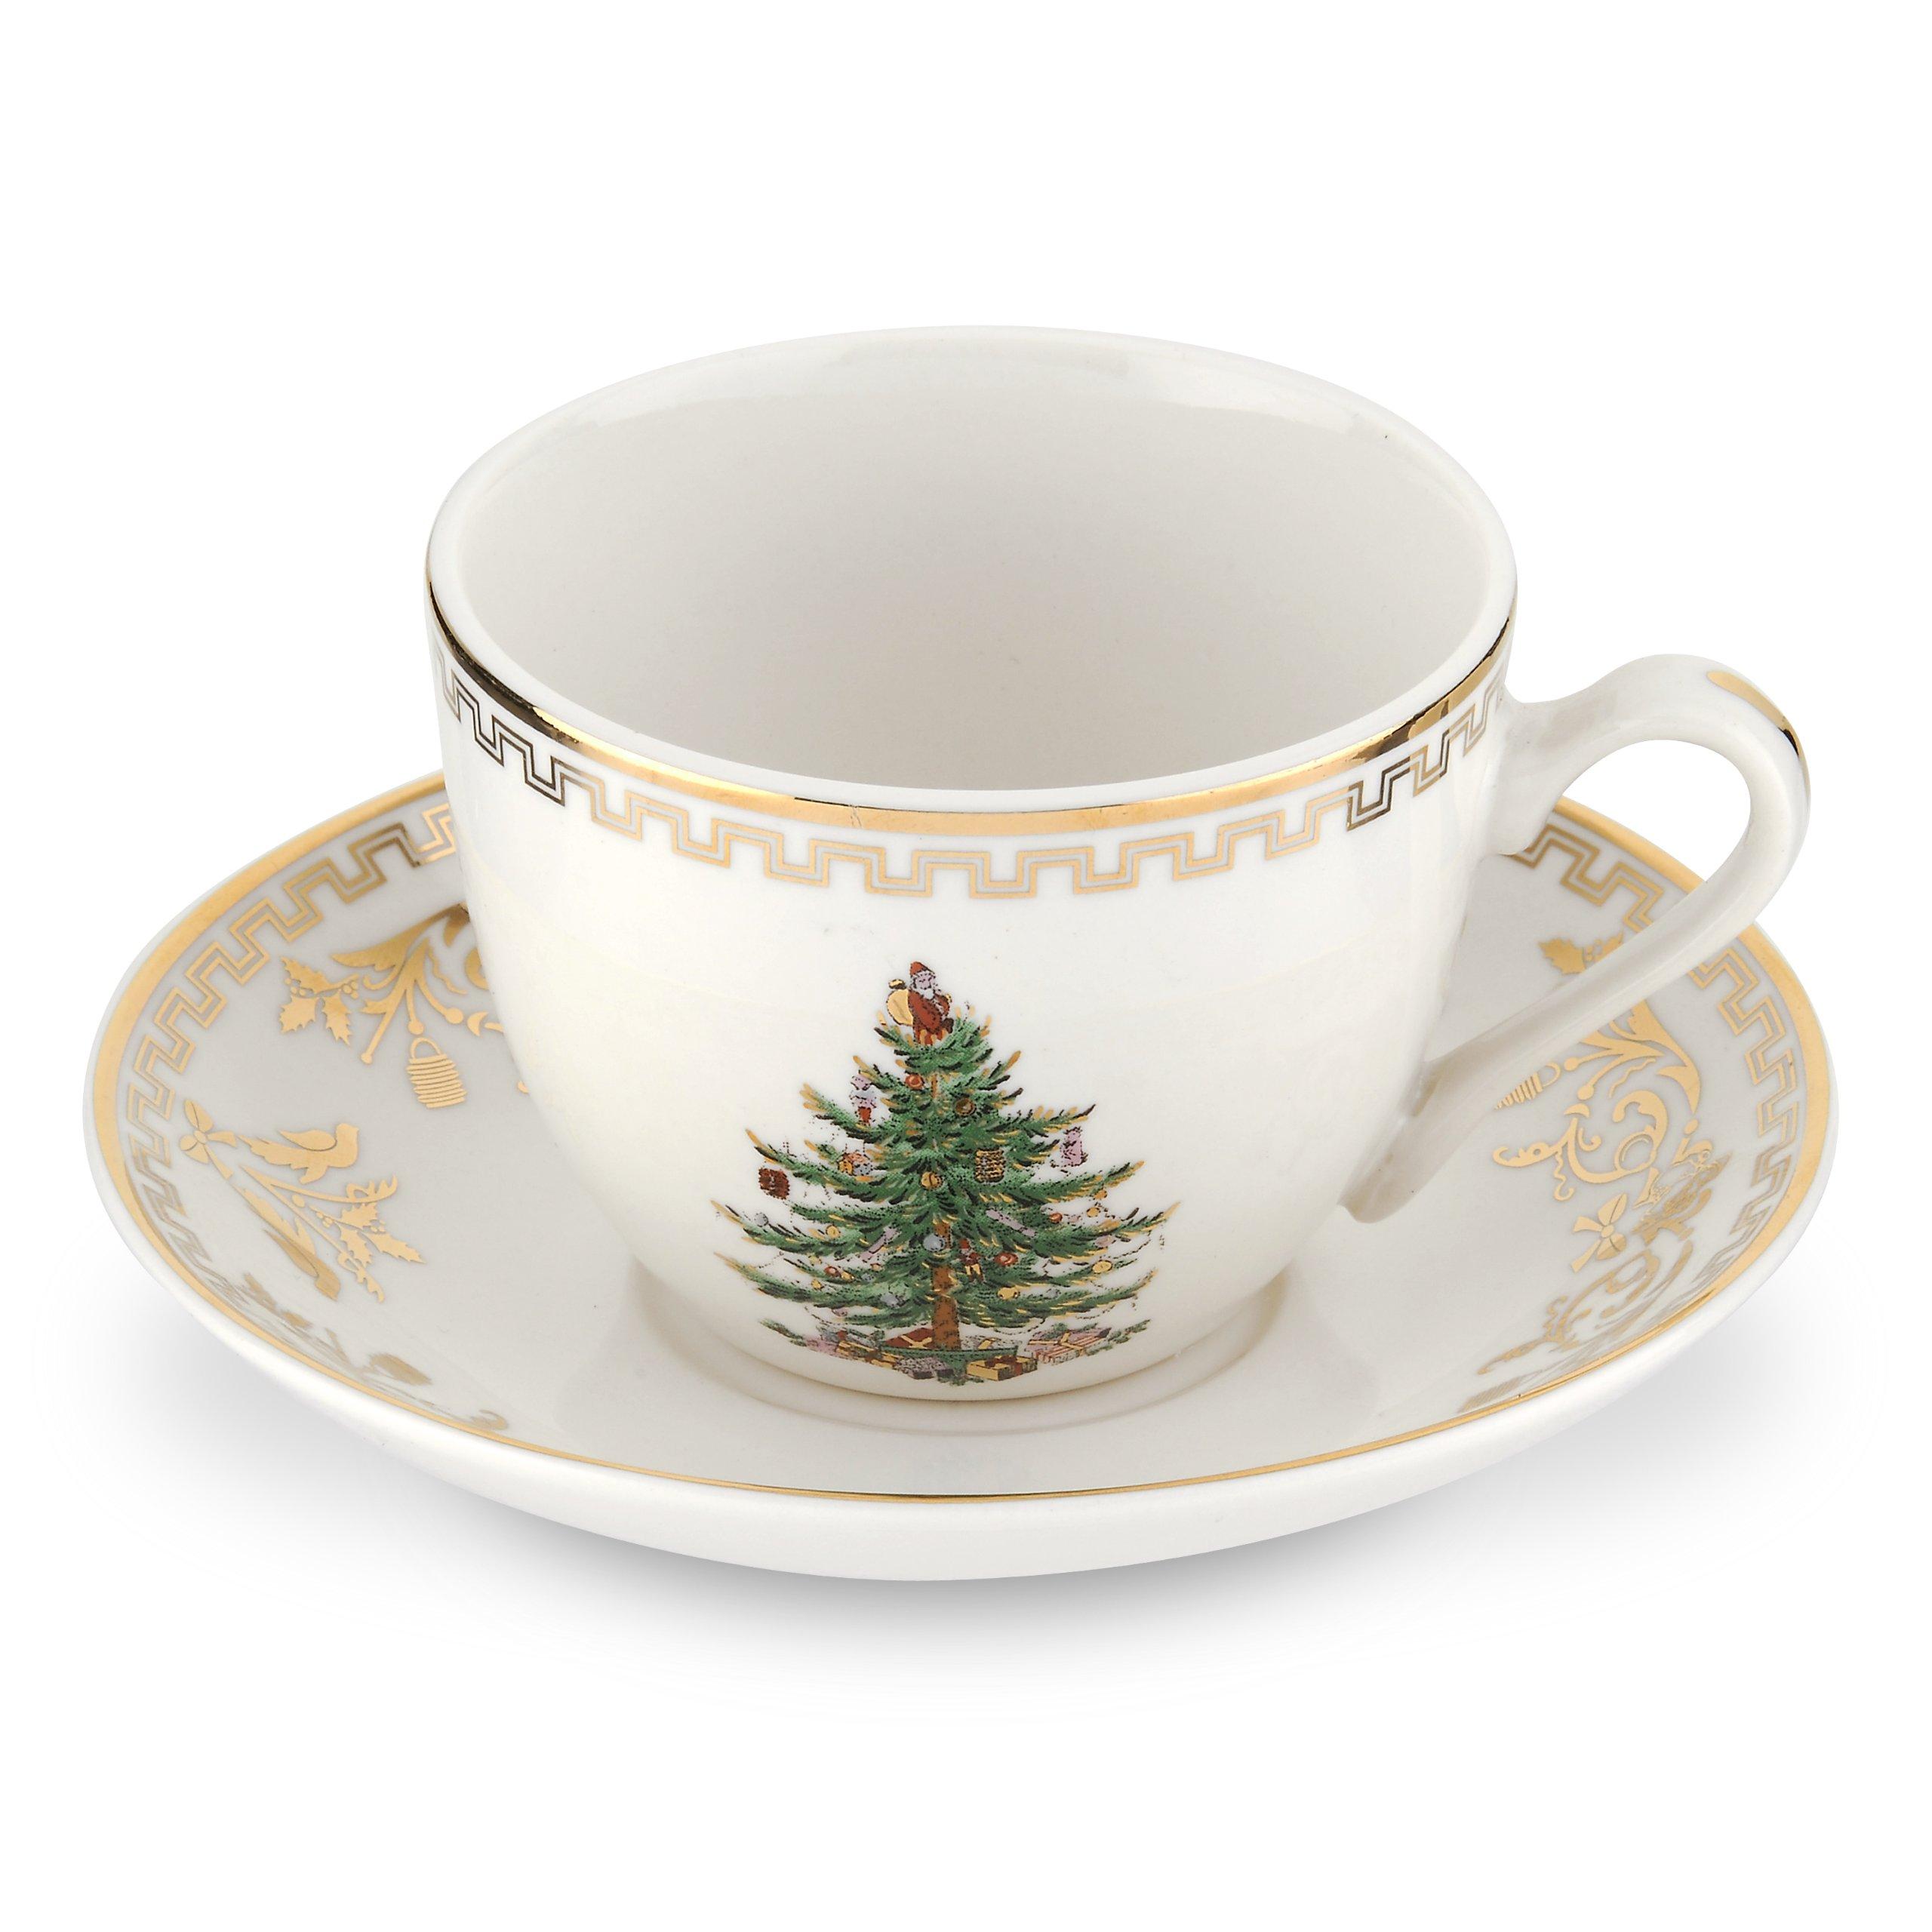 Spode Christmas Tree Gold Teacup and Saucer, Set of 4